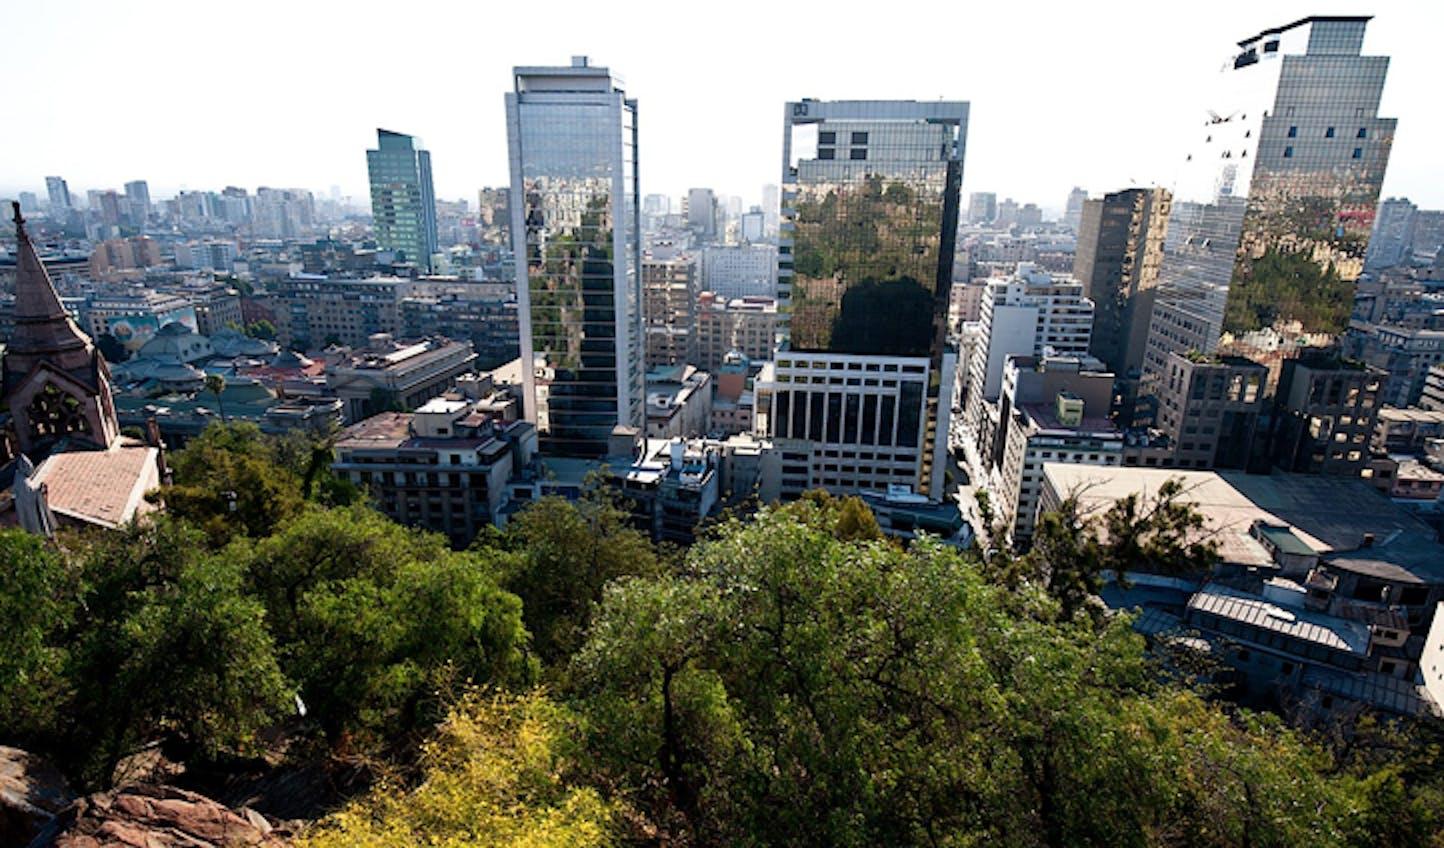 Views over Santiago, Chile